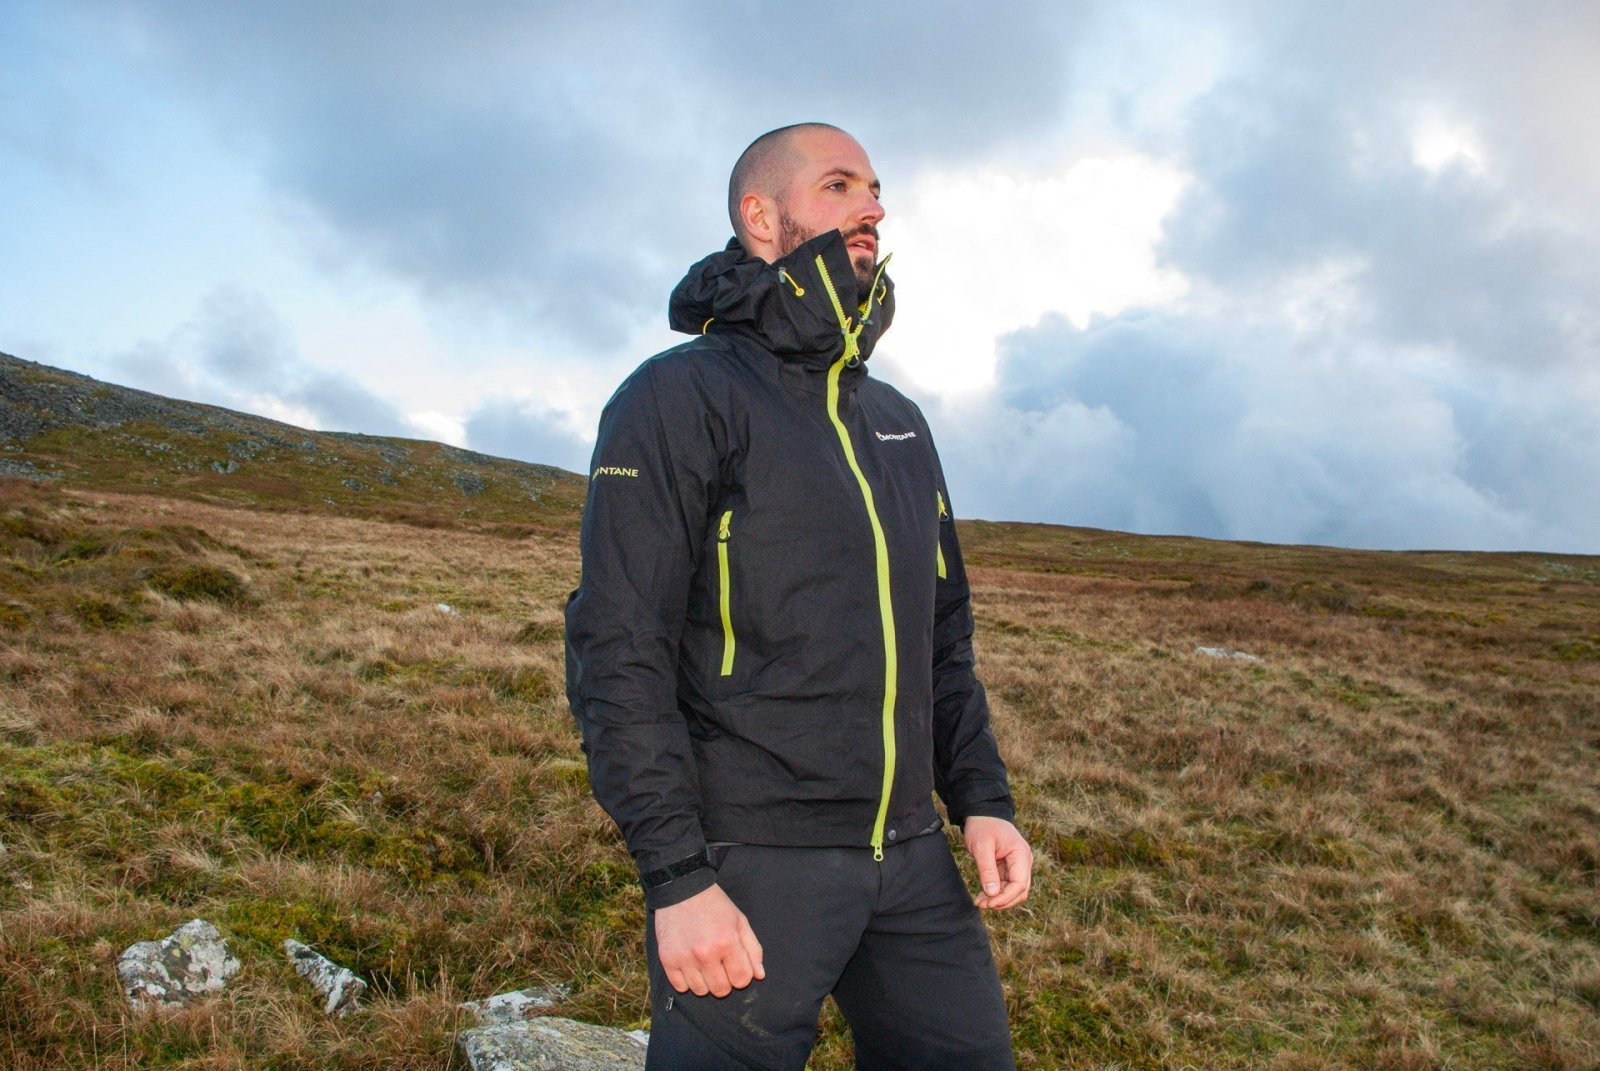 Montane Men's Fast Alpine Stretch Neo Jacket Review